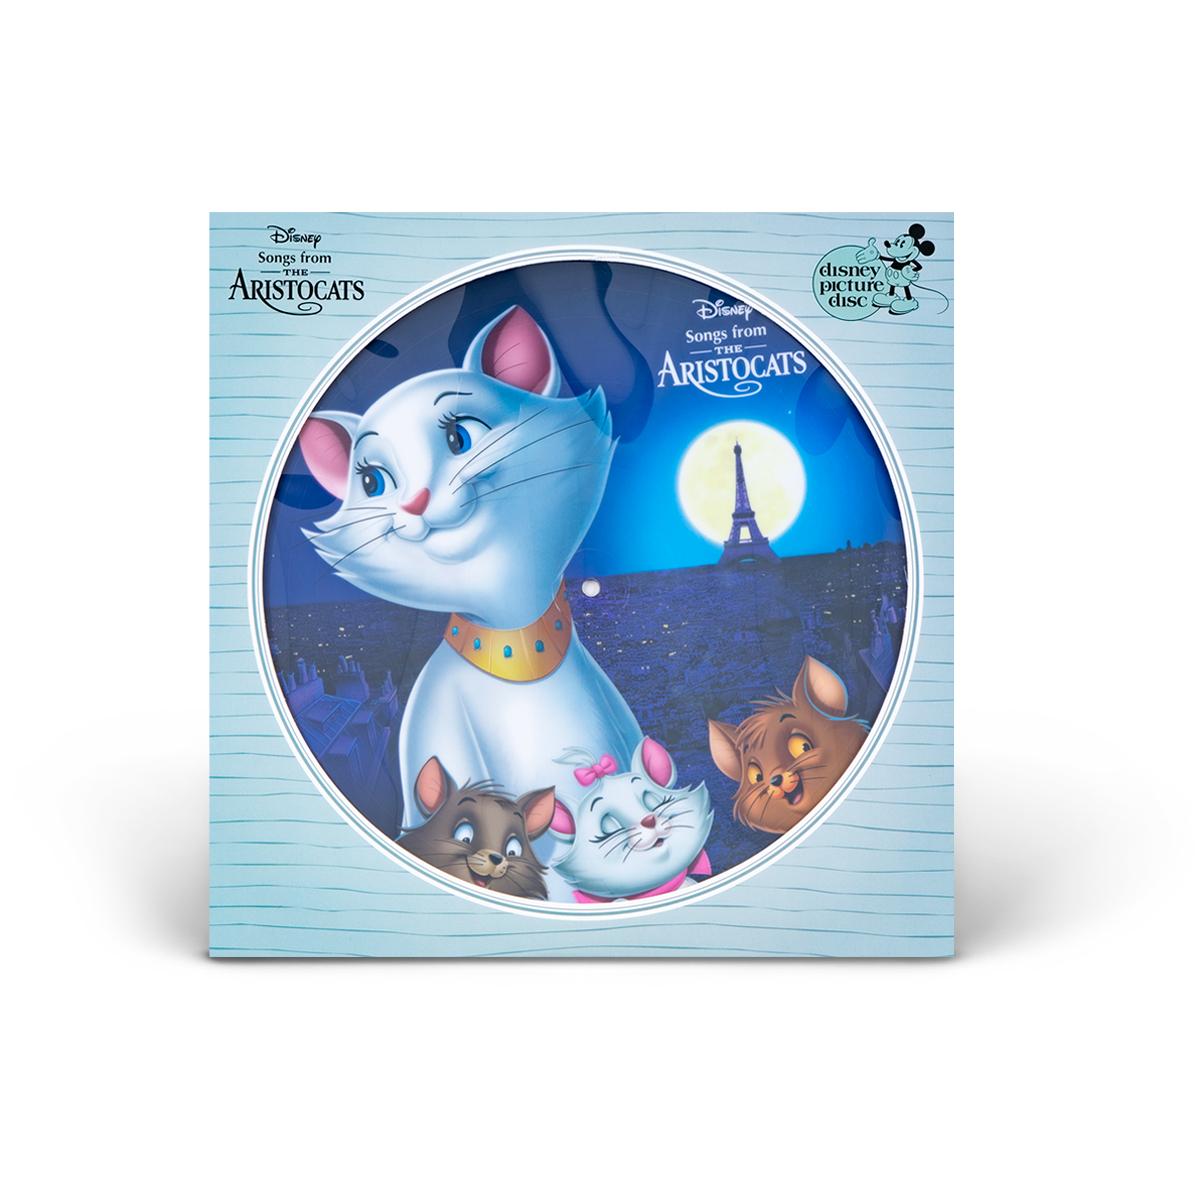 Aristocats Picture Disc Vinyl